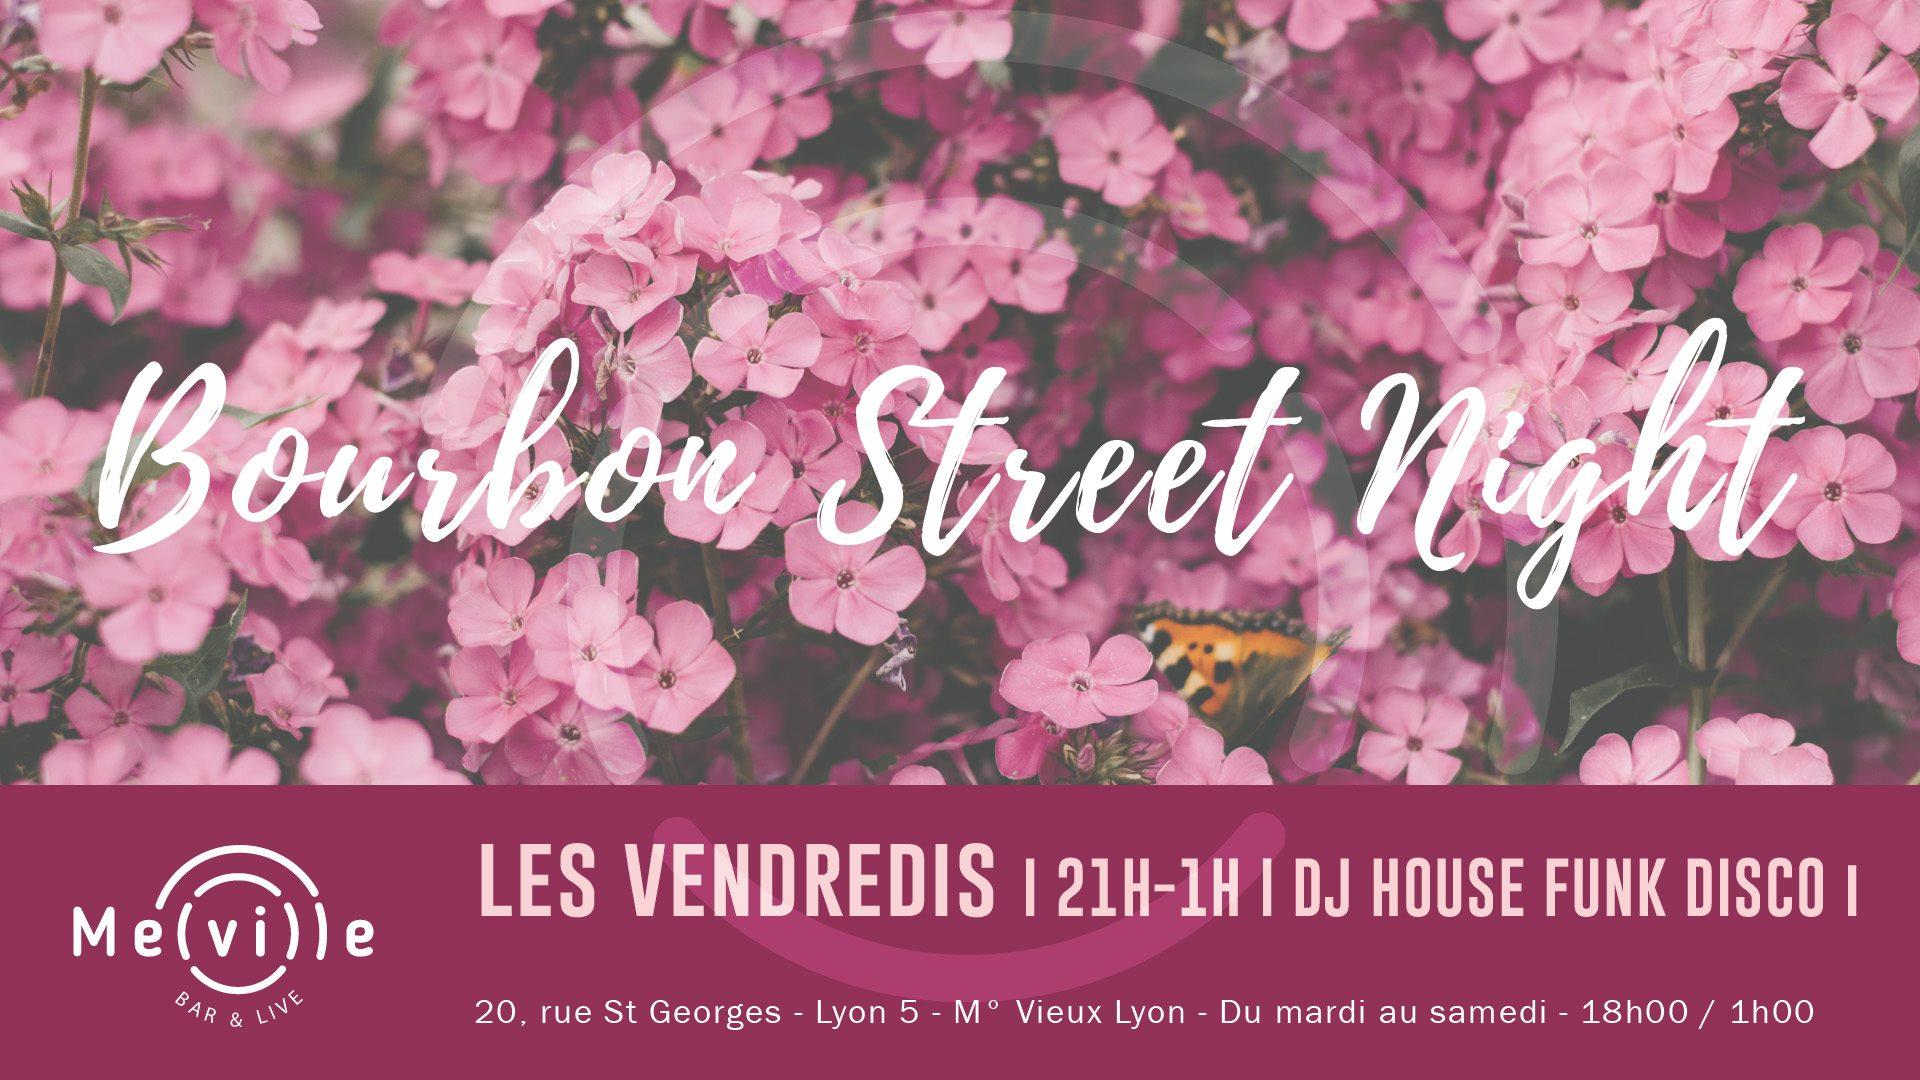 Image - Soirée - Bourbon street night au Melville (Lyon)